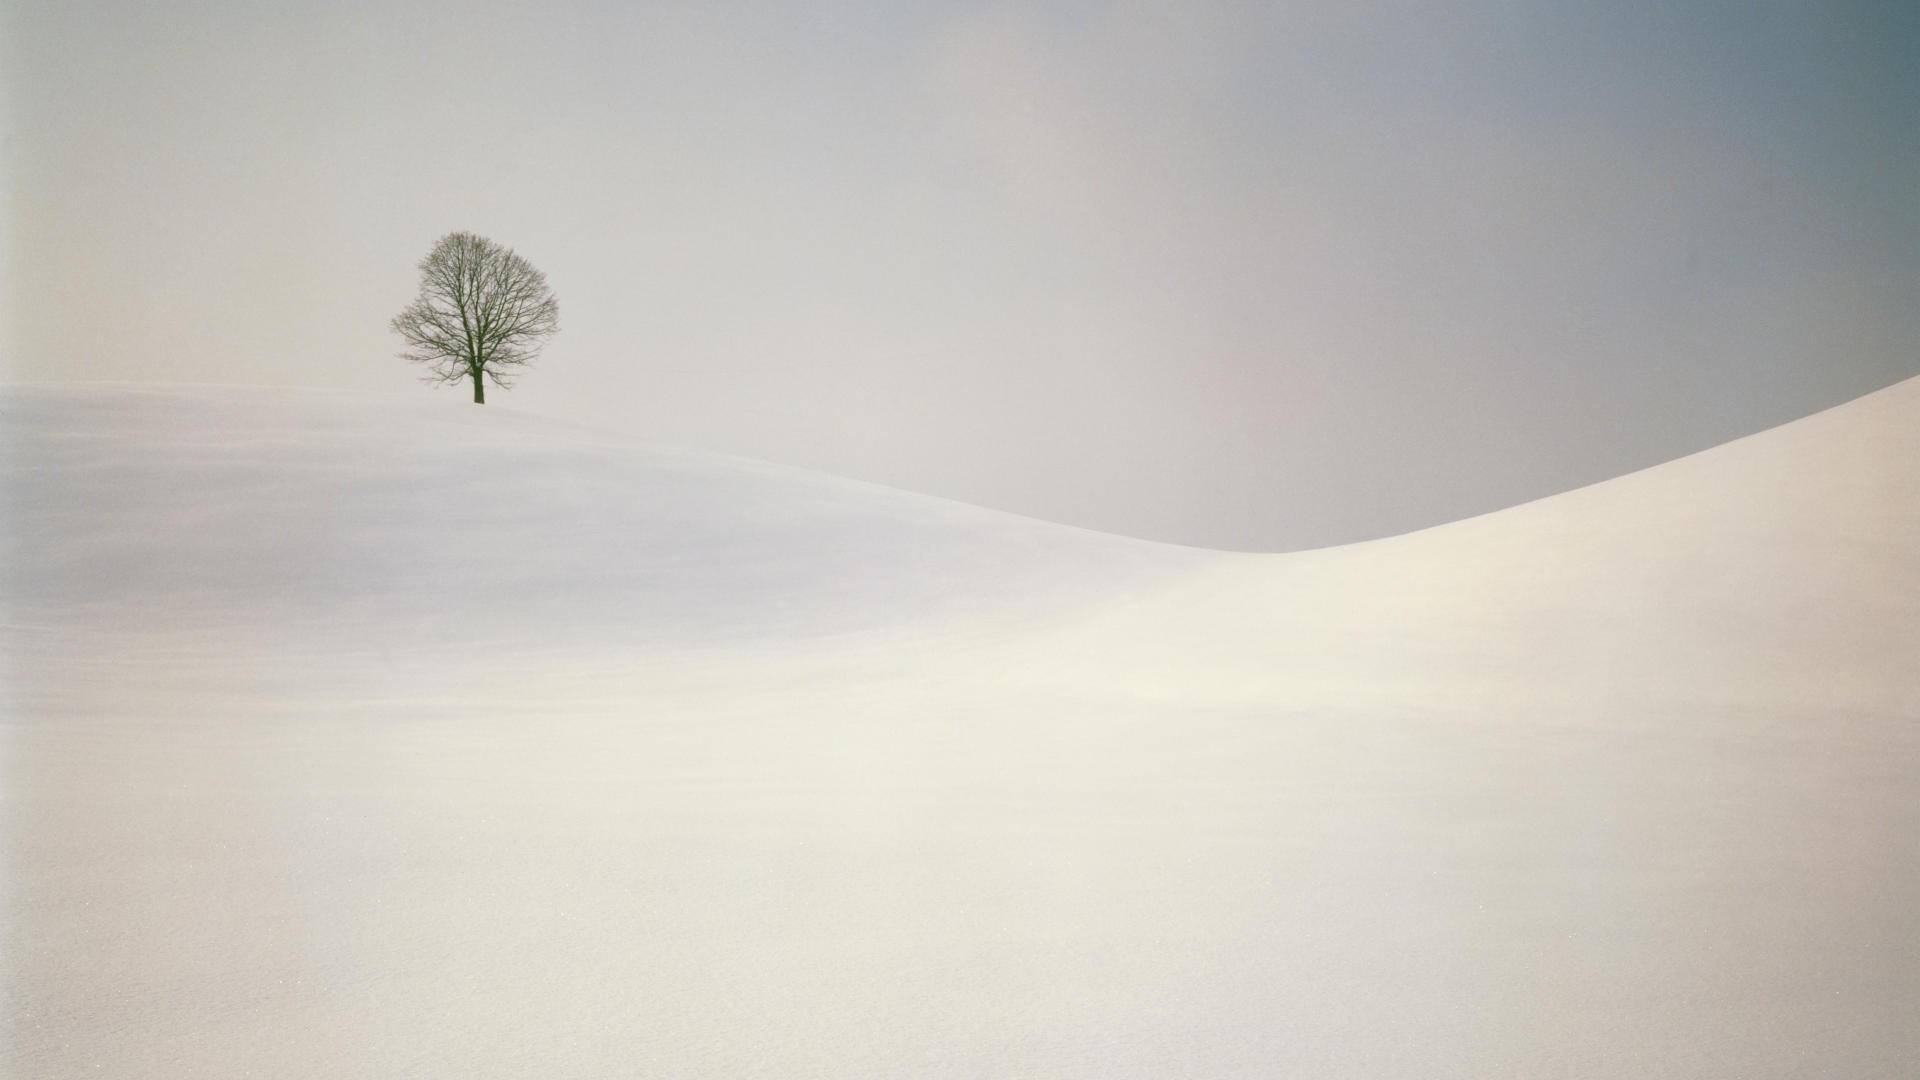 Lonely Trees Minimalist HD Wallpaper